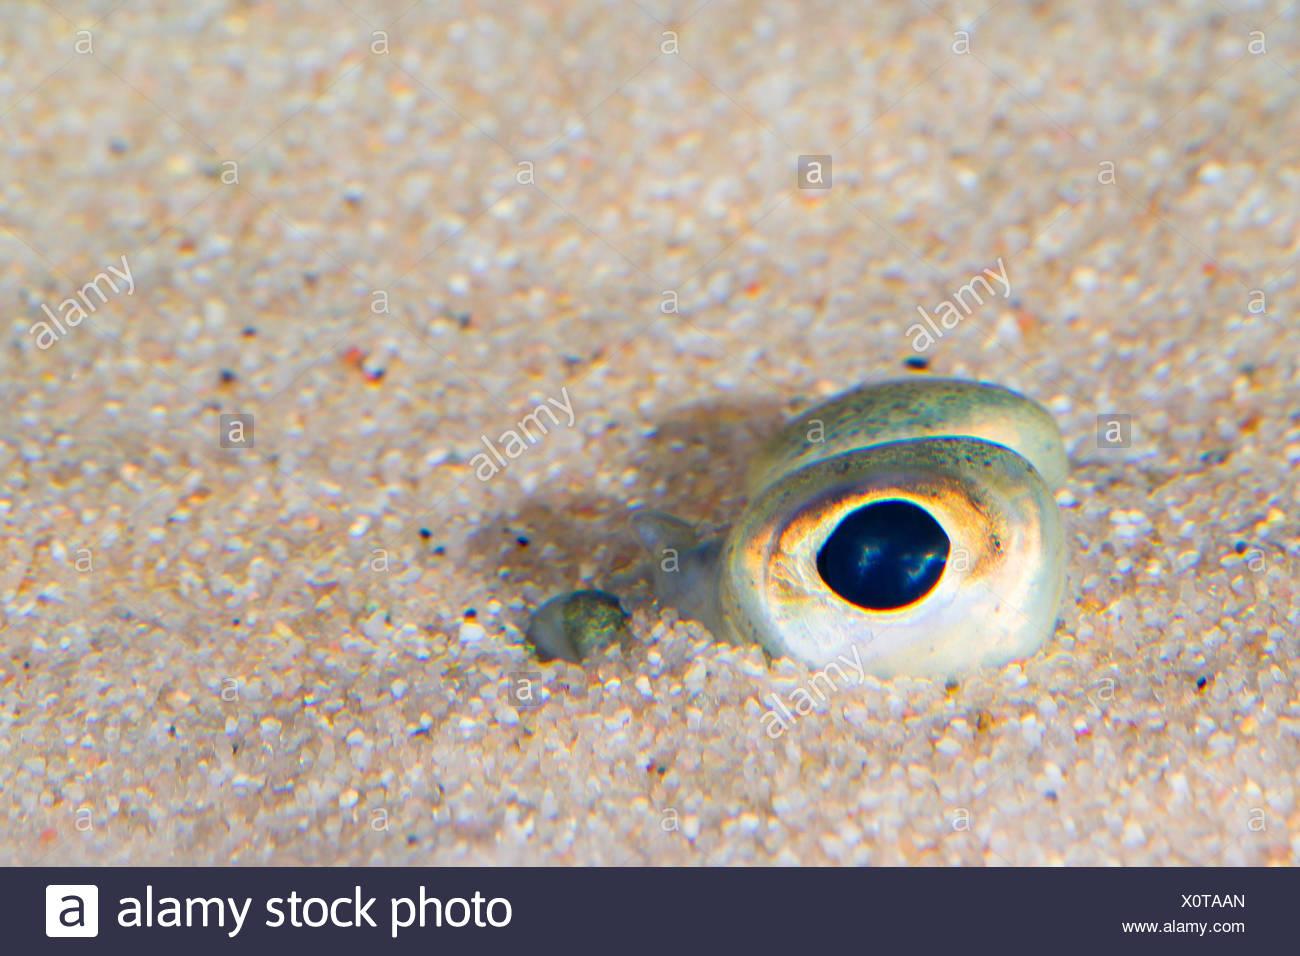 plaice, European plaice (Pleuronectes platessa), dug in the sand only the eyes can be seen Stock Photo